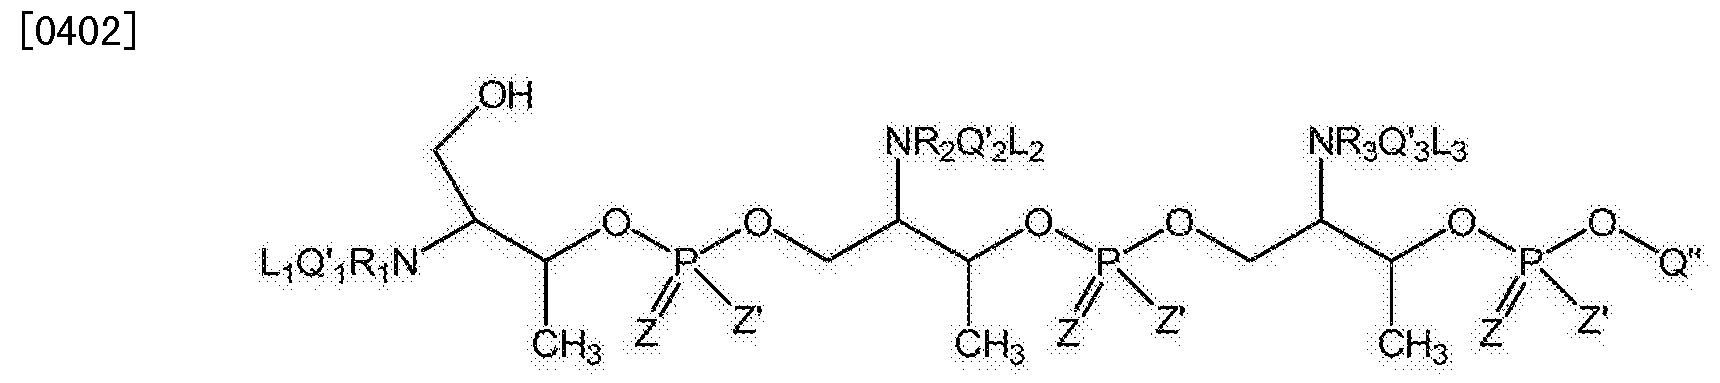 Figure CN105378080AD00403